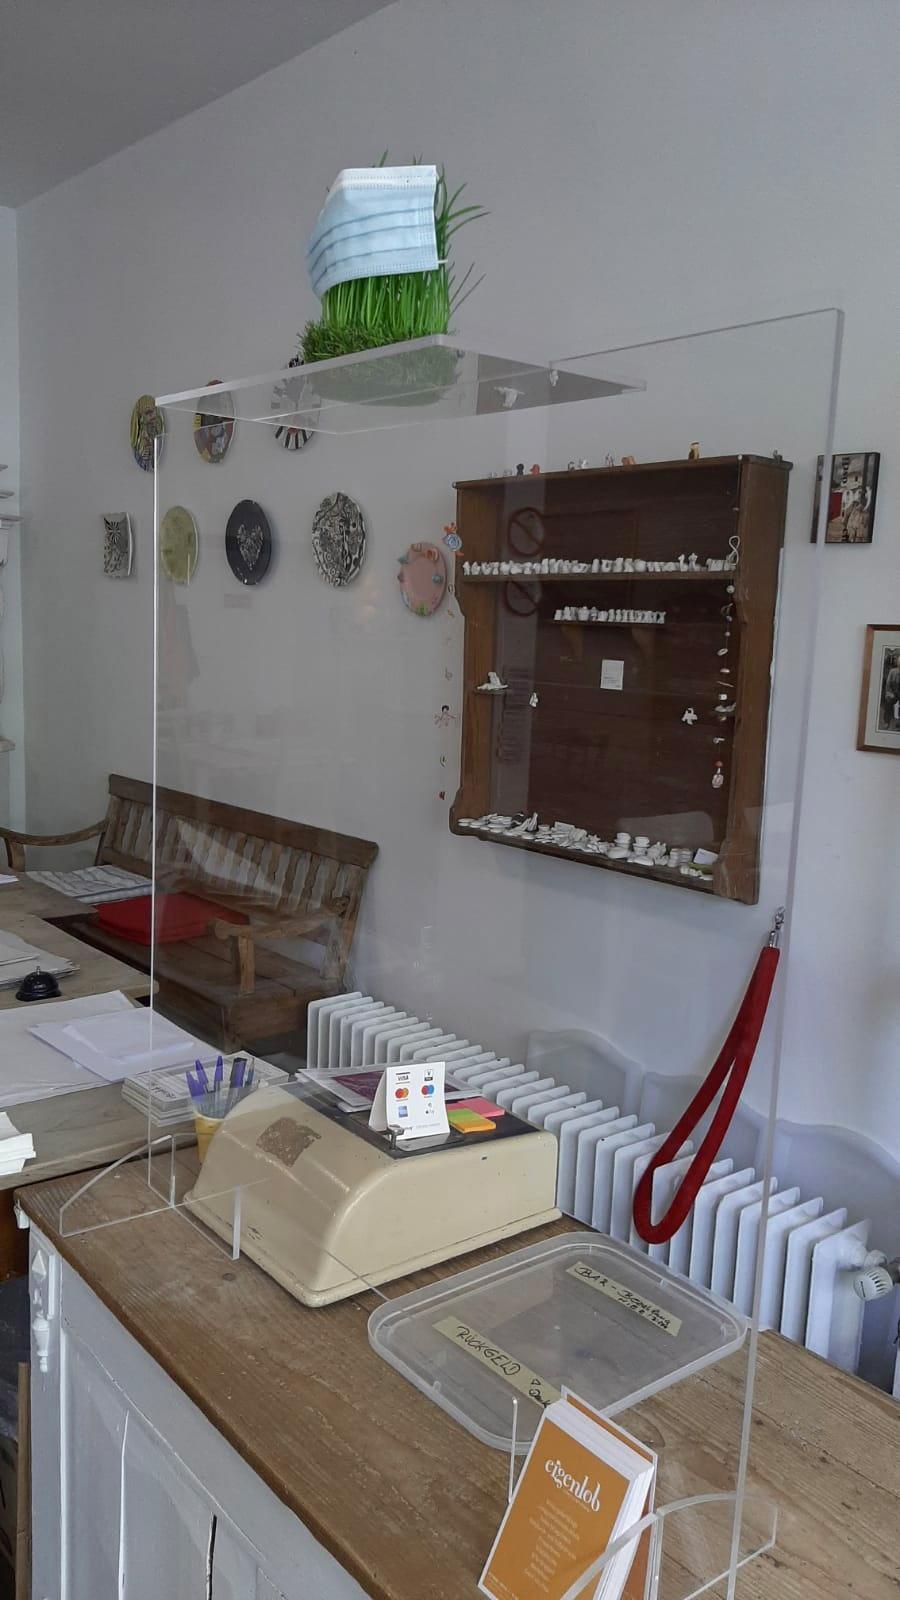 Kassenbereich Eigenlob Keramik bemalen